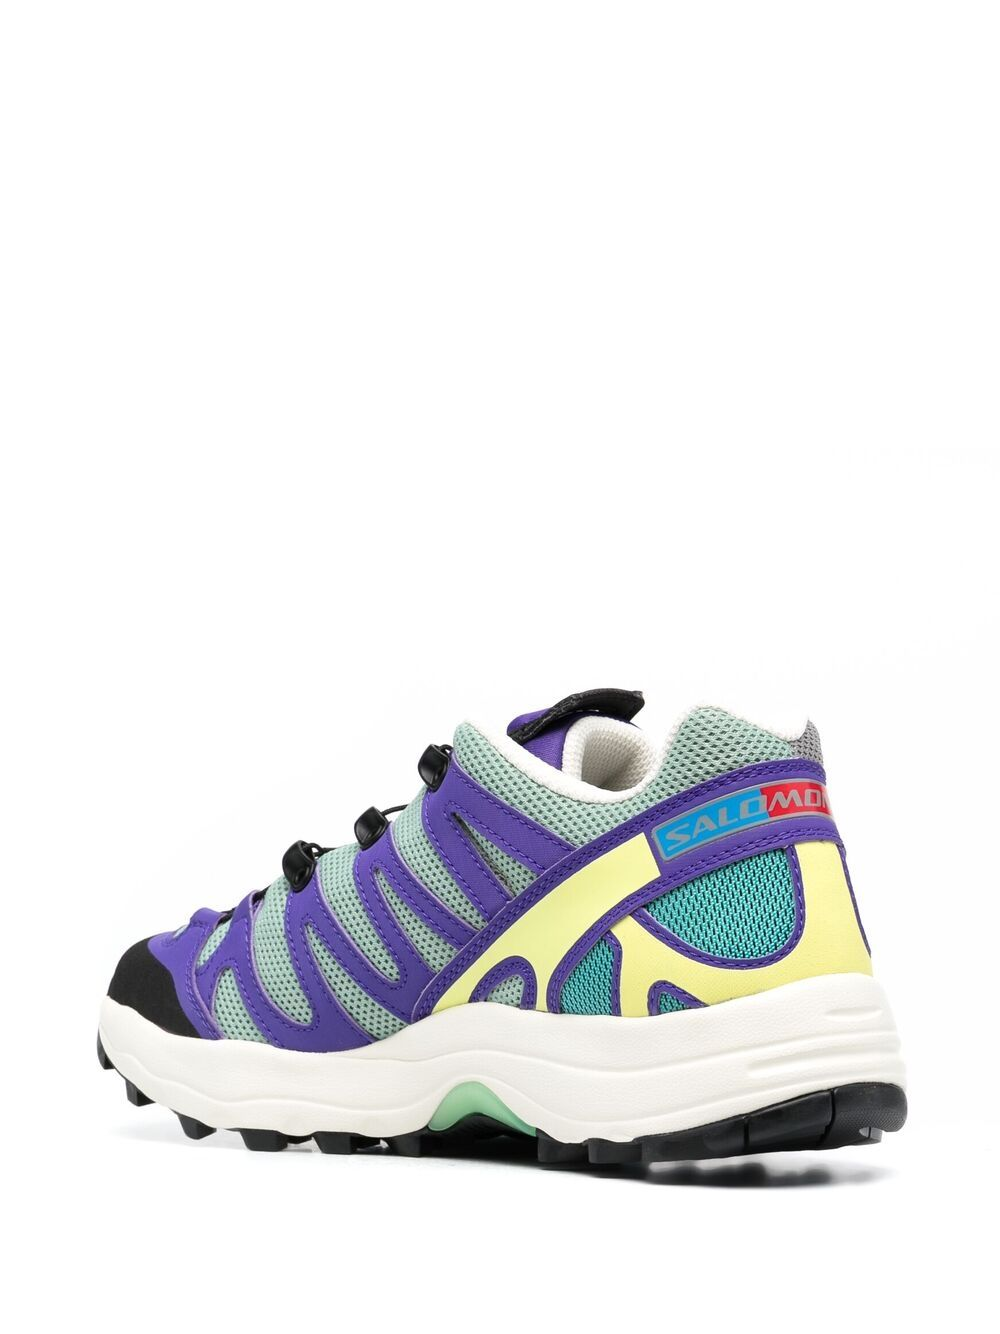 xa sneakers man multicolor SALOMON S/LAB   Sneakers   L41390000